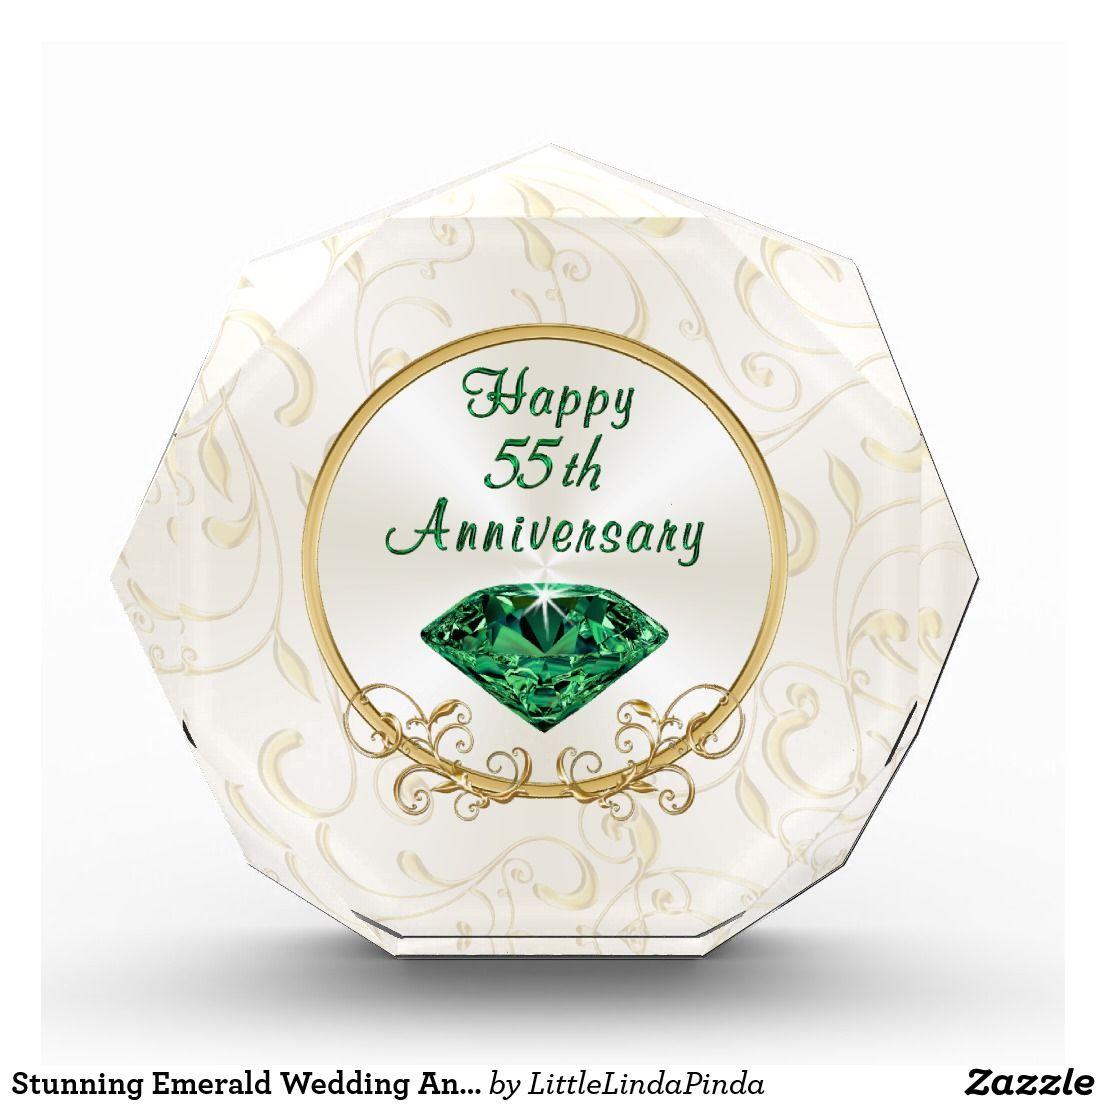 Stunning Emerald Wedding Anniversary Gifts Wedding Anniversary And